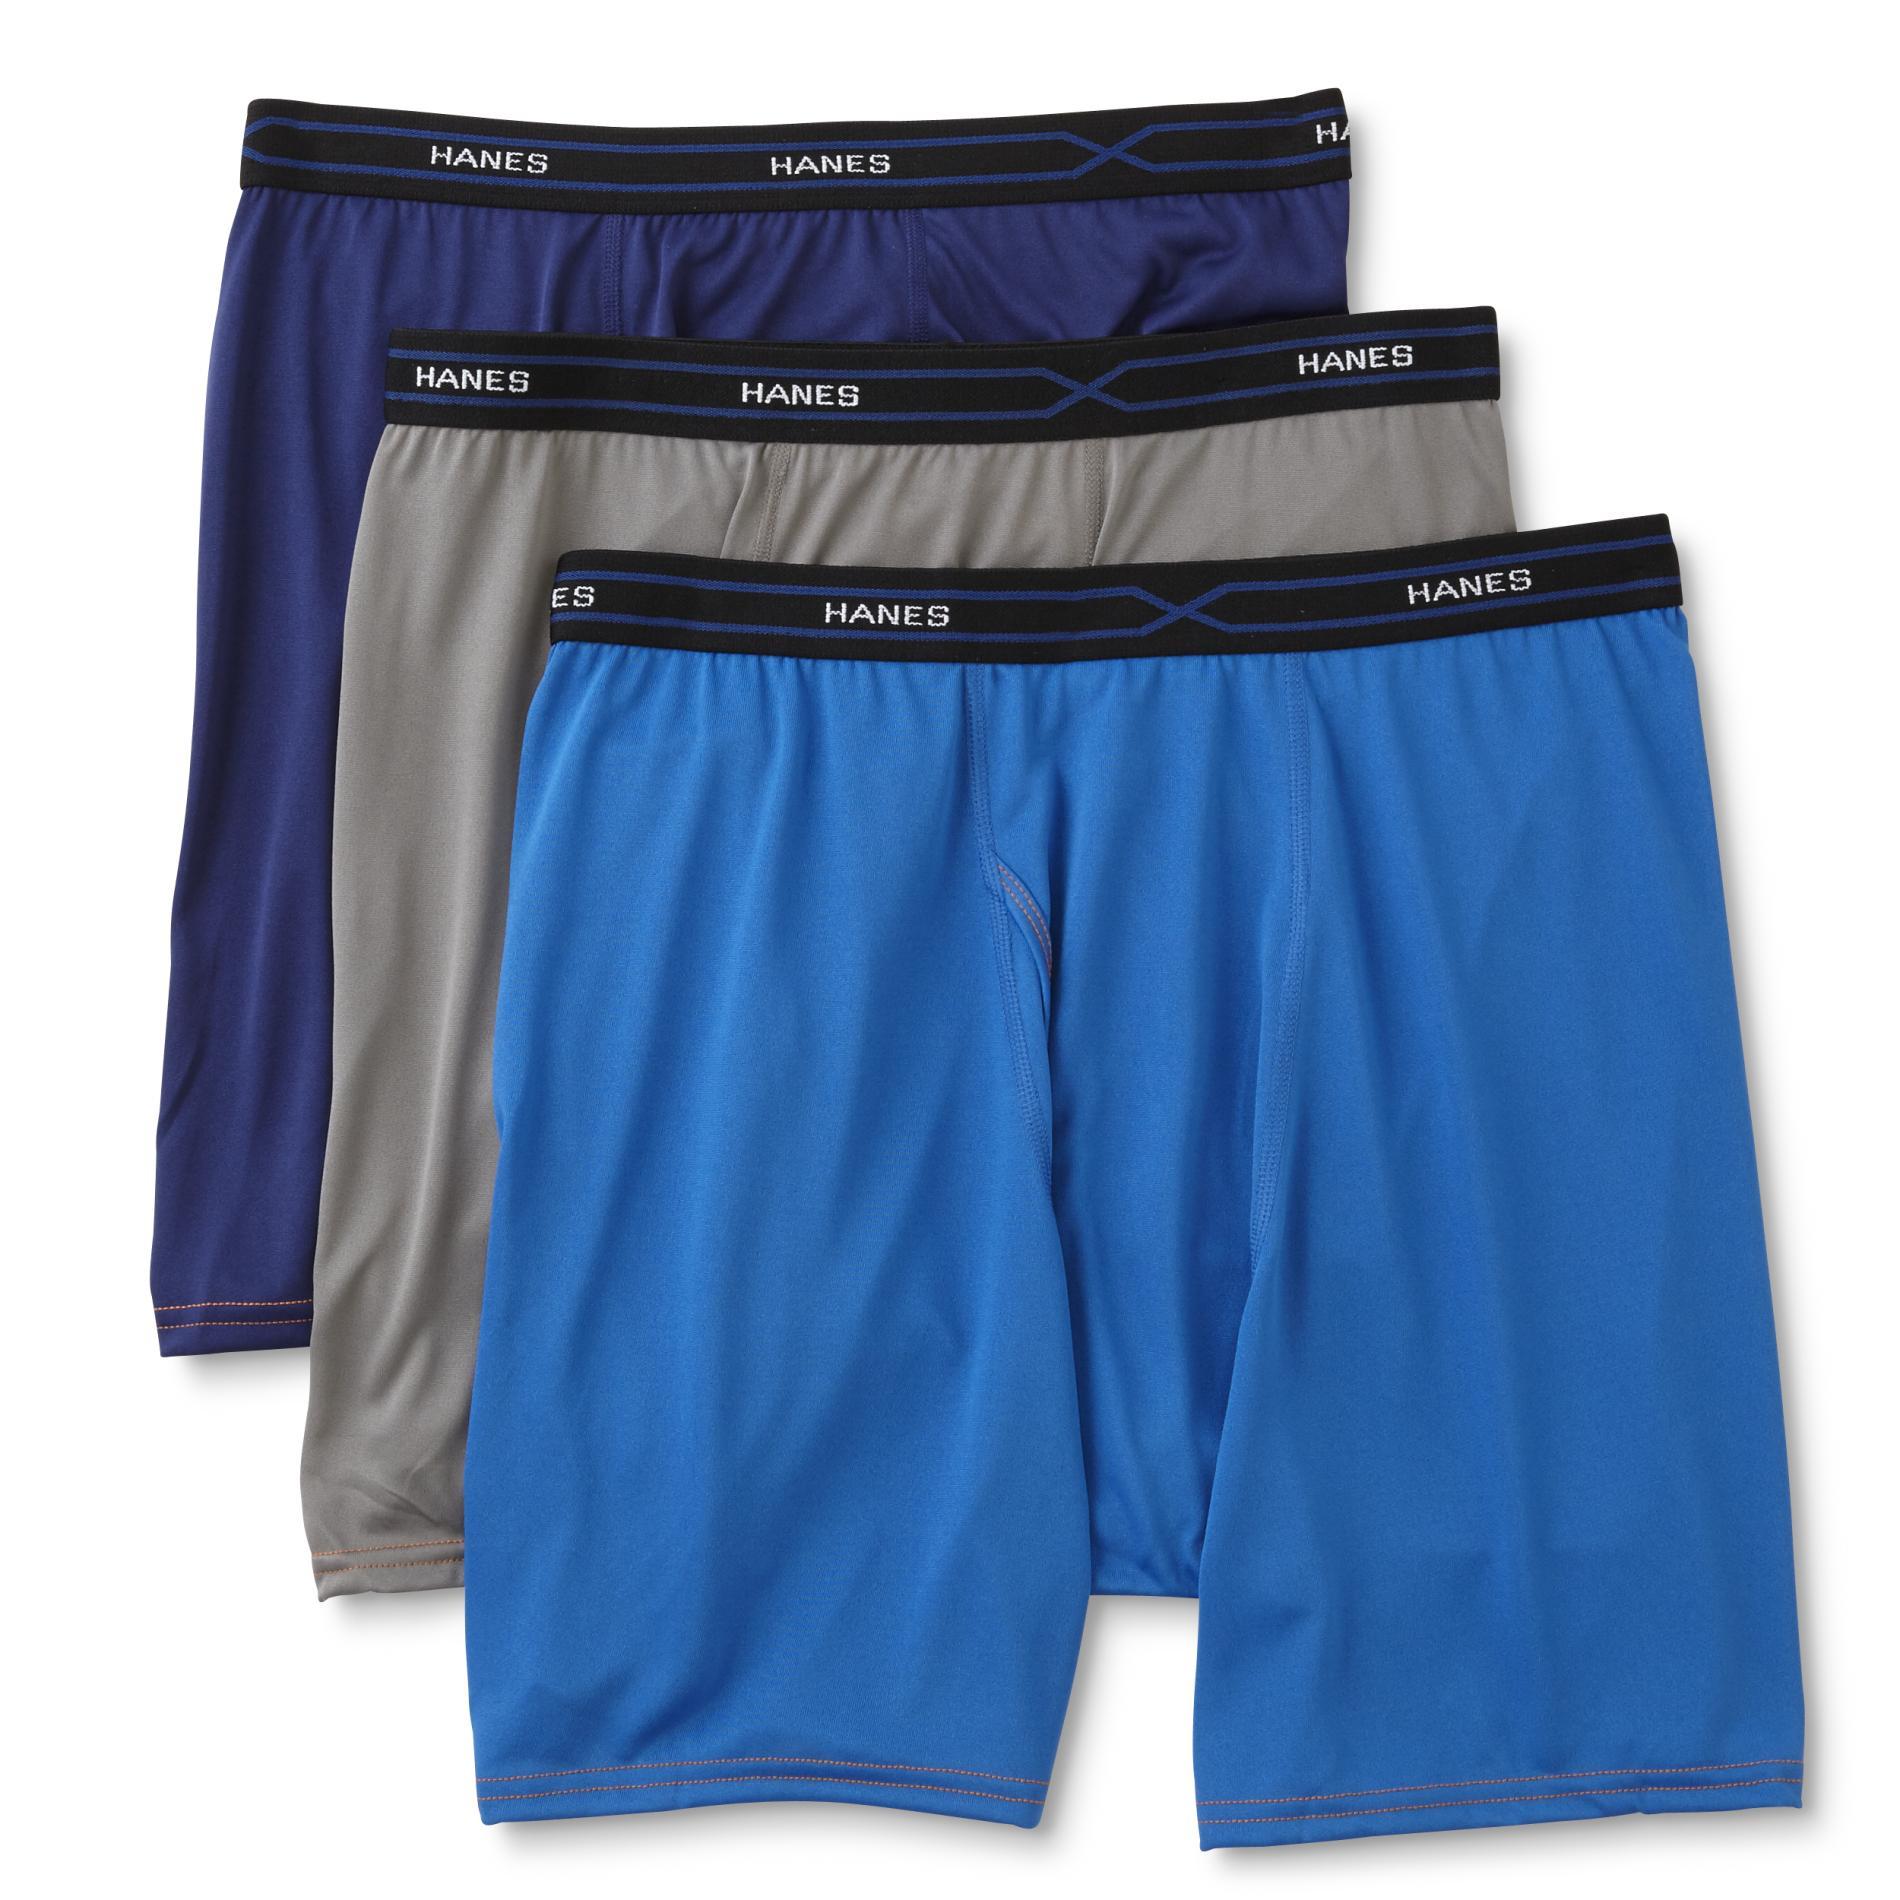 Hanes Men' 4-pairs X-temp Boxer Briefs